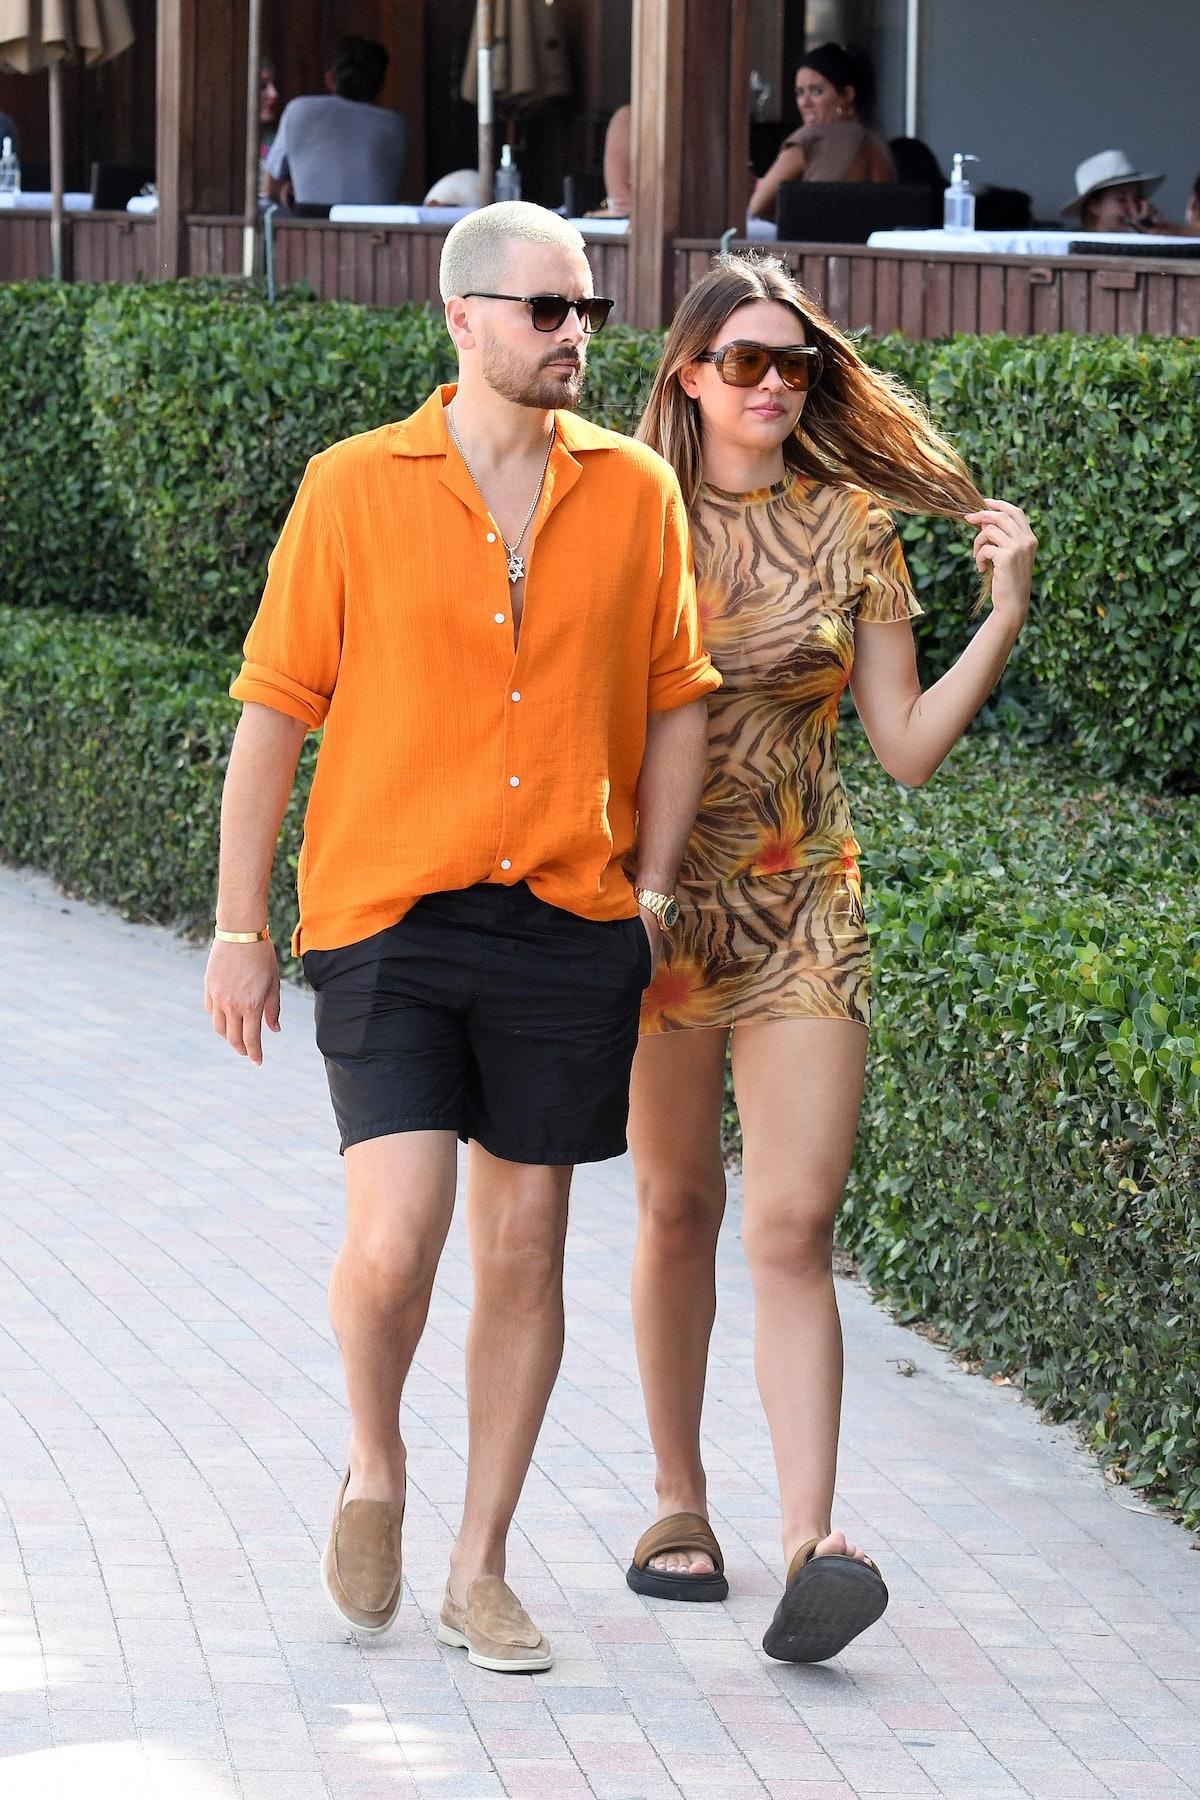 MIAMI FL - APRIL 7: Scott Disick and Amelia Hamlin are seen walking at the beach on April 7, 2021 in Miami, Florida. (Photo by MEGA/GC Images)